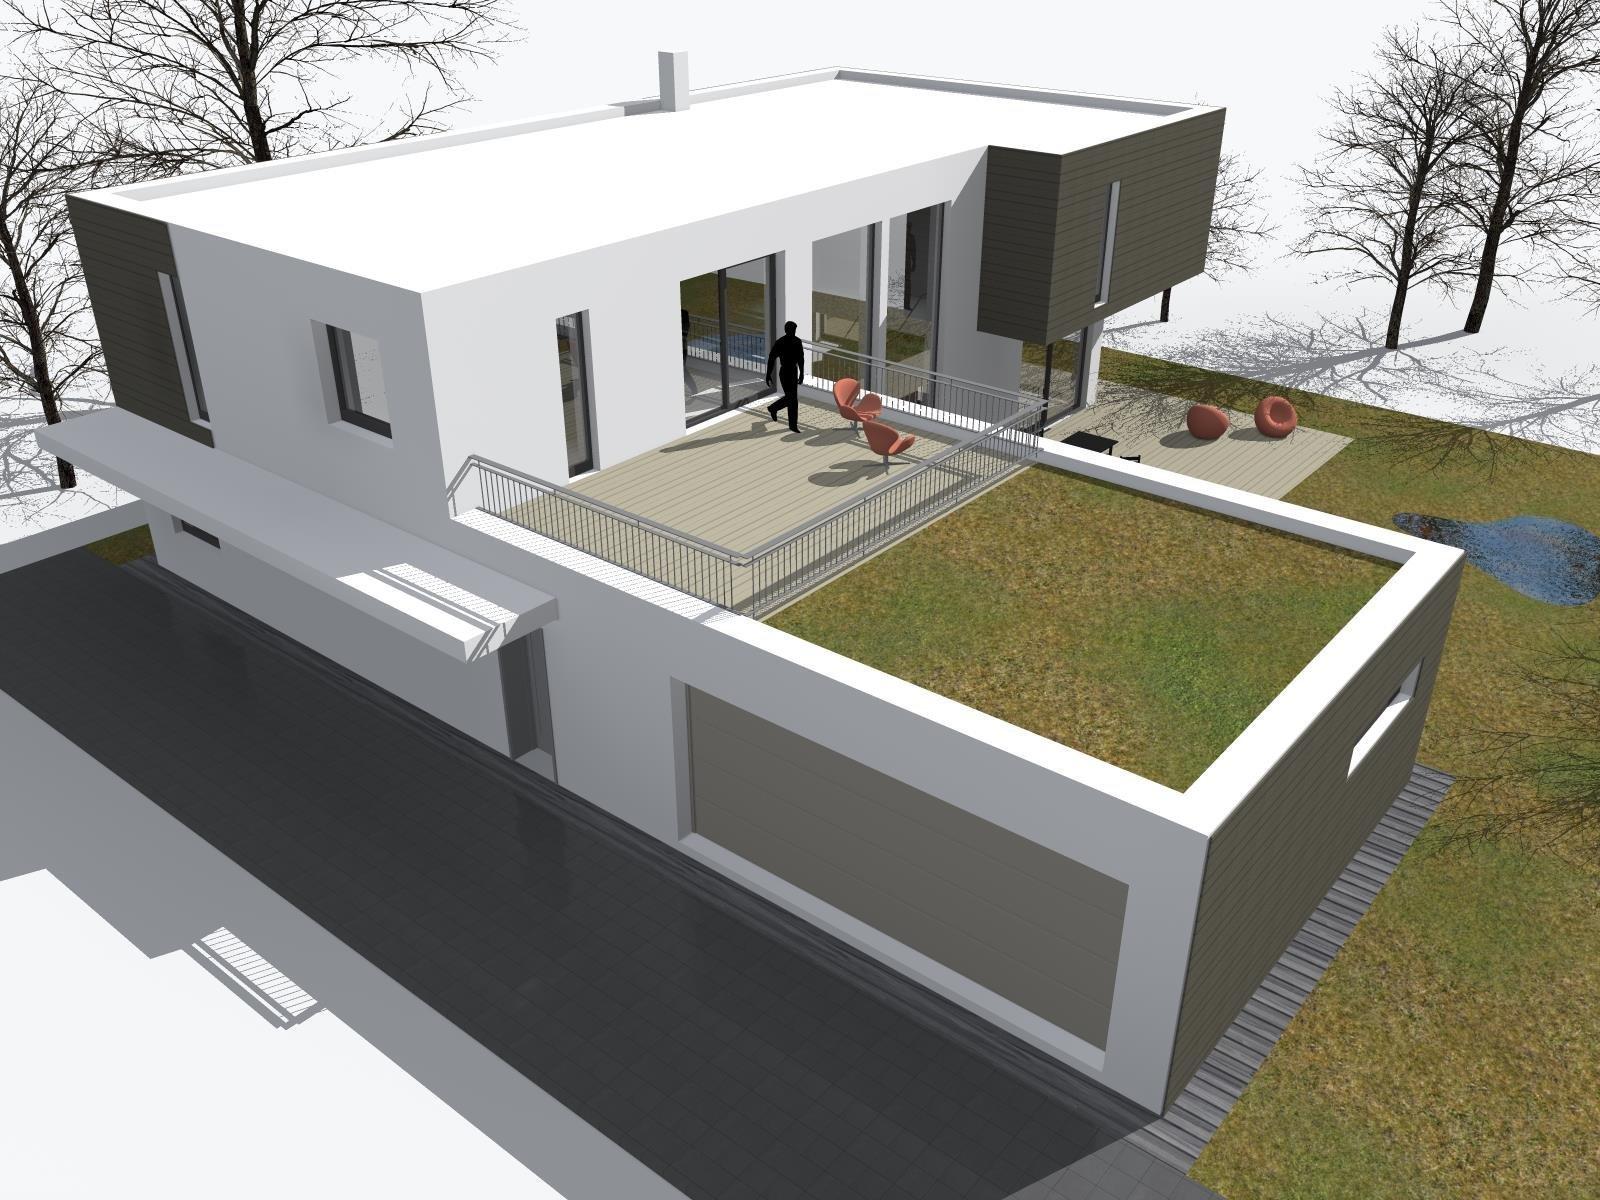 Novostavba rodinného domu v príjemnom zelenom prostredí.